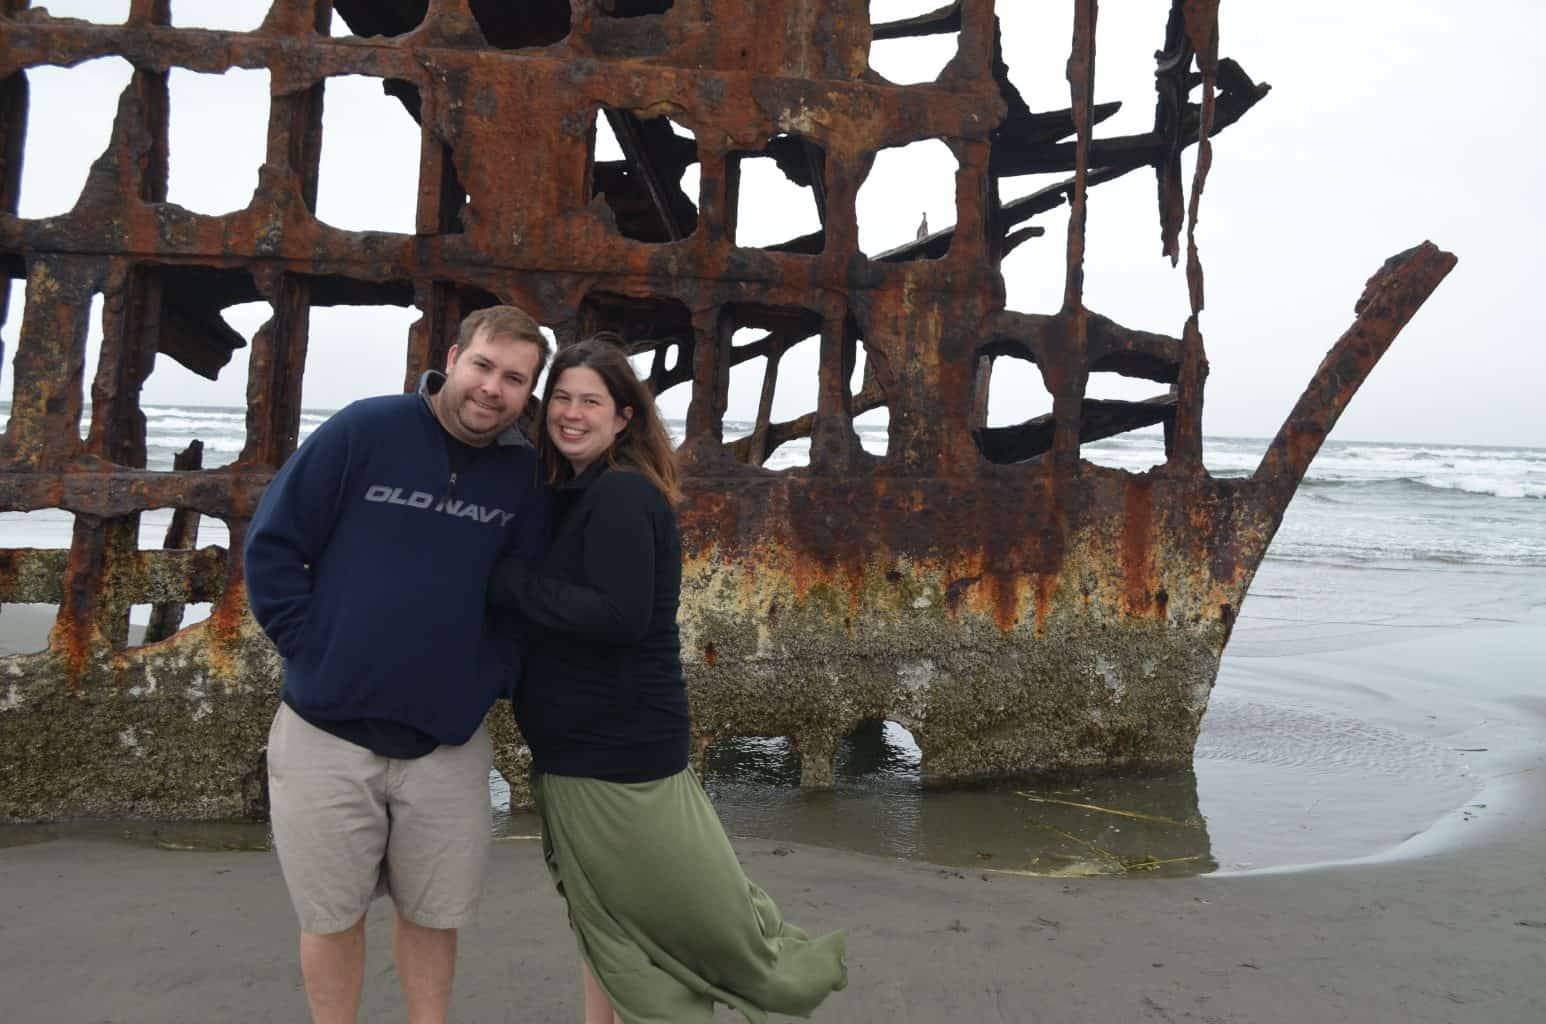 Peter Iredale shipwreck in Oregon coast